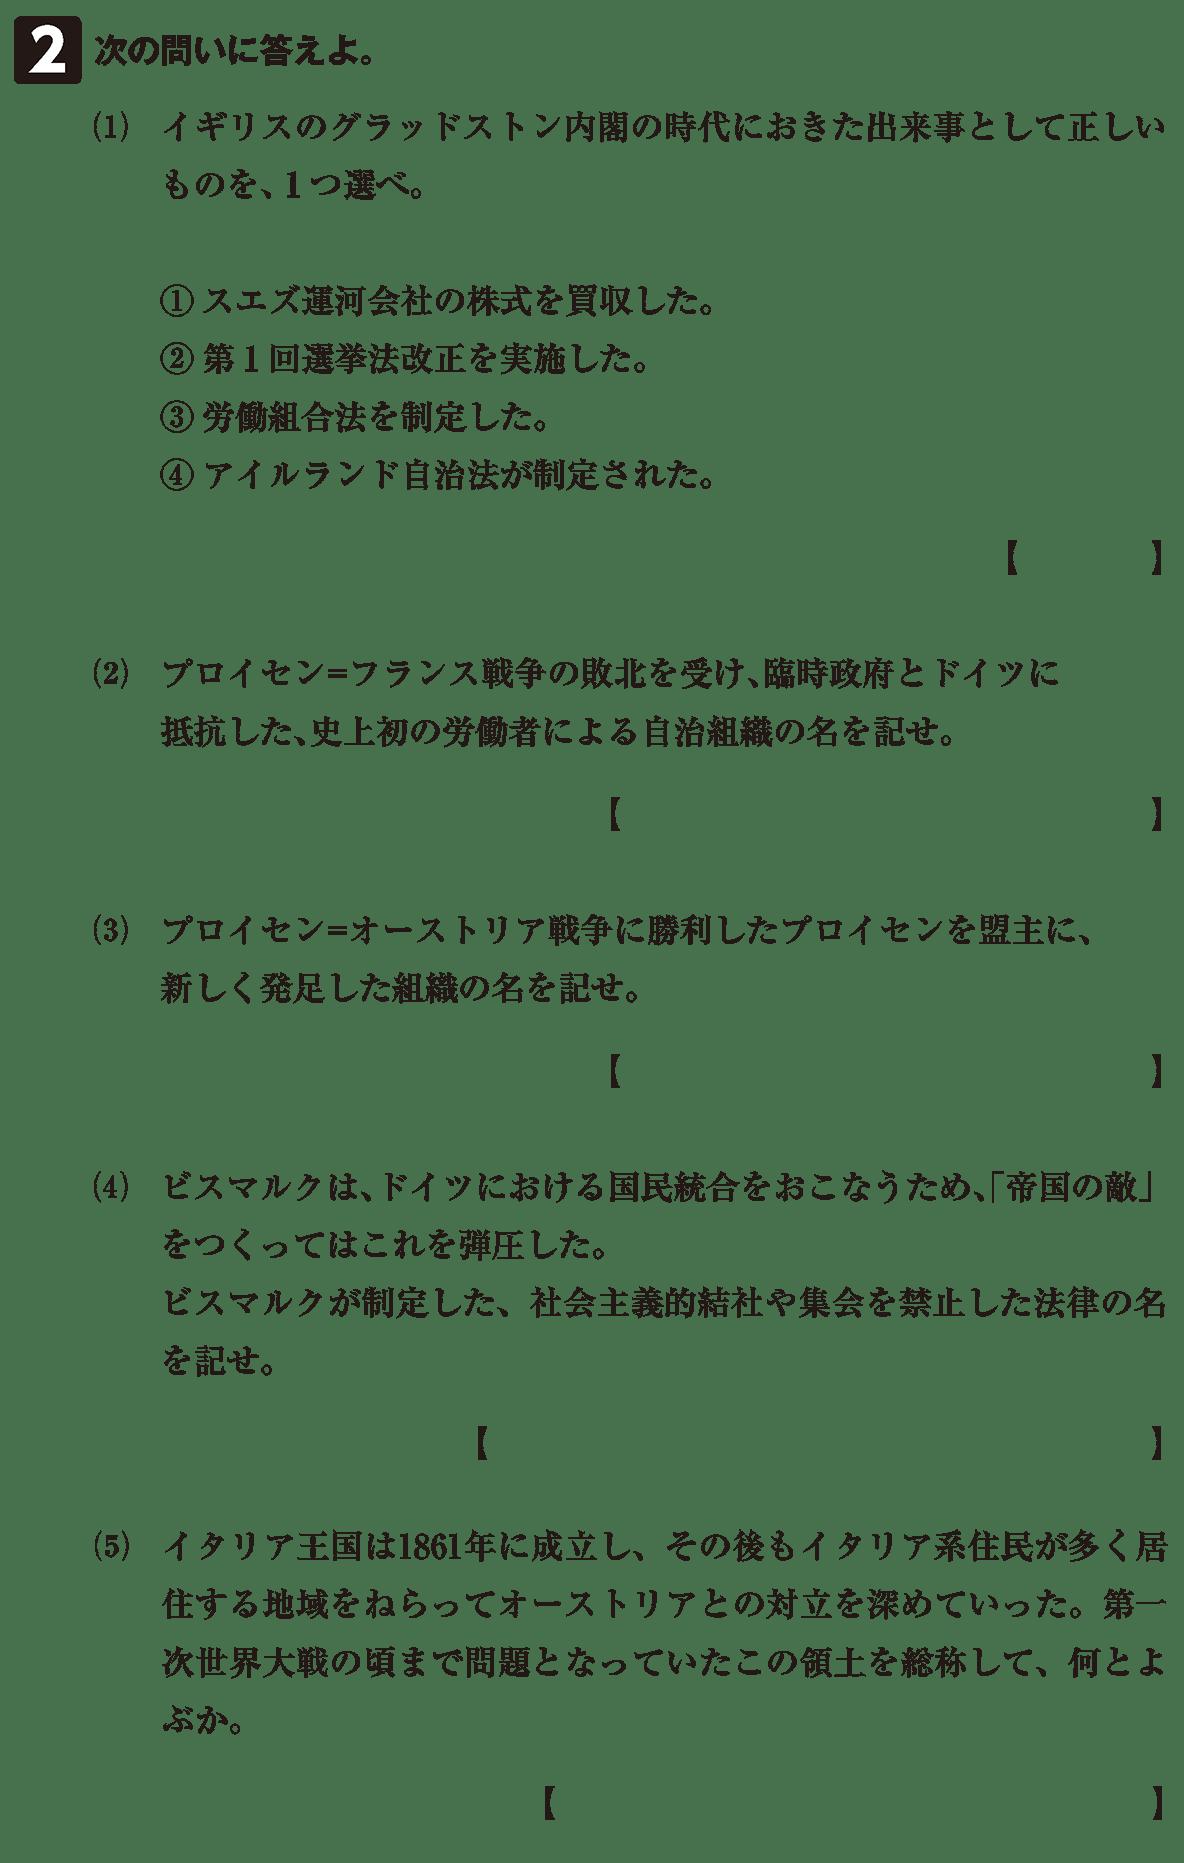 19世紀の欧米諸国(1)英・仏・伊・独9 確認テスト(後半)